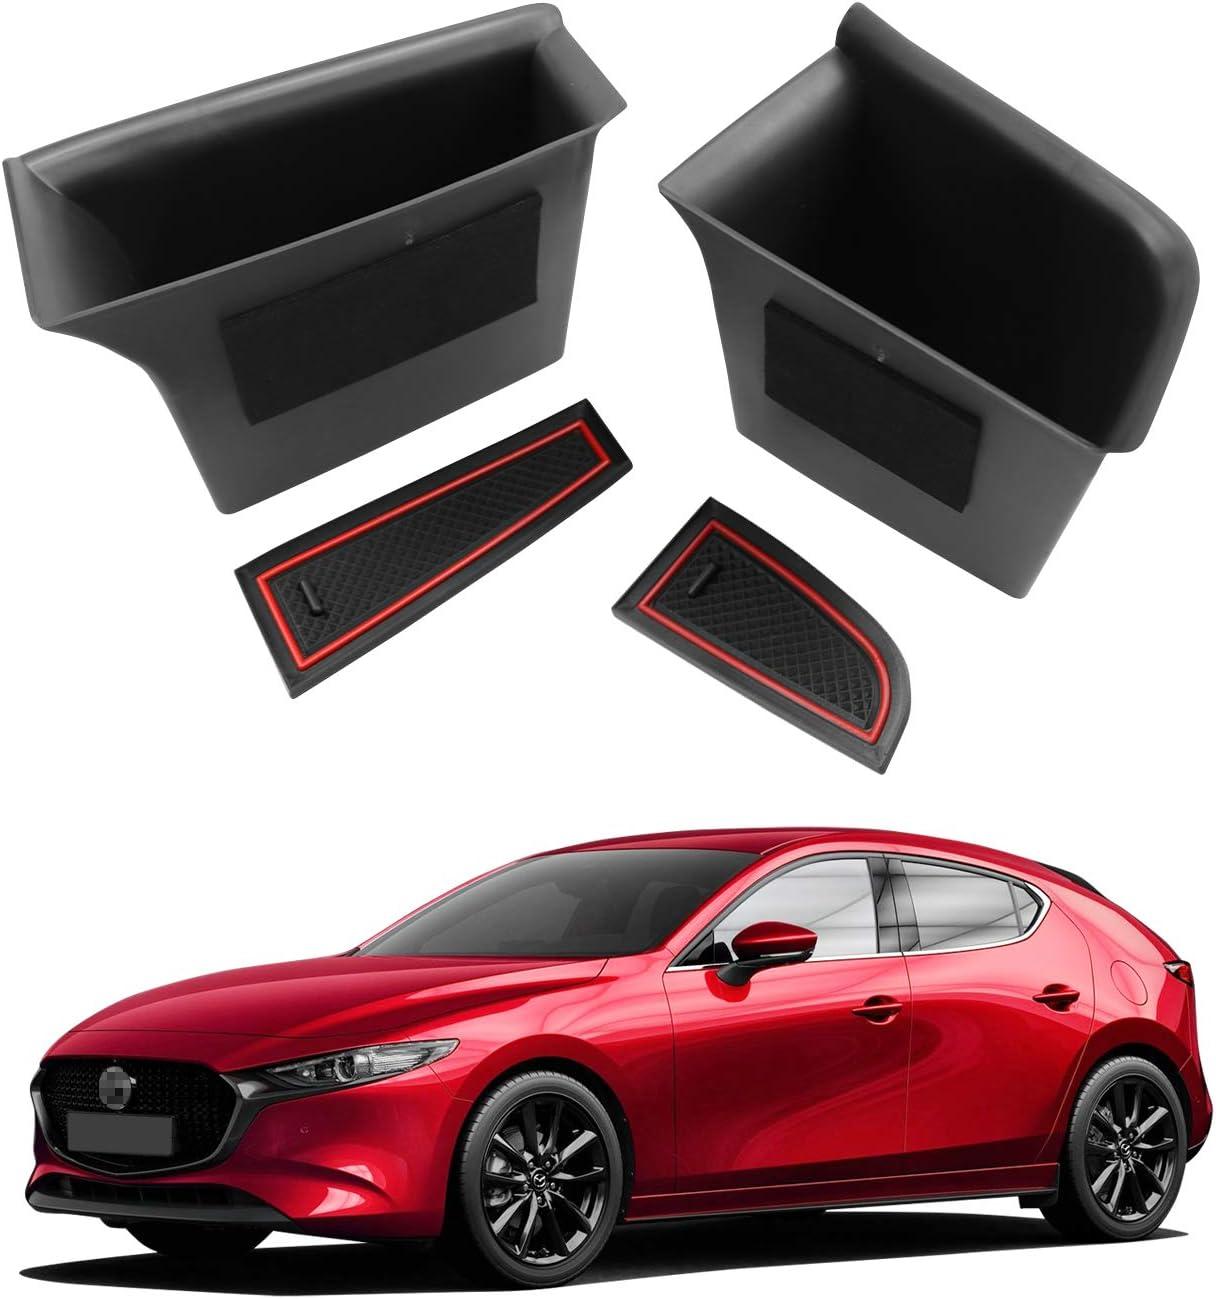 4PCS YEE PIN Front + Rear Door Organizer Tray Car Door Side Handle ...